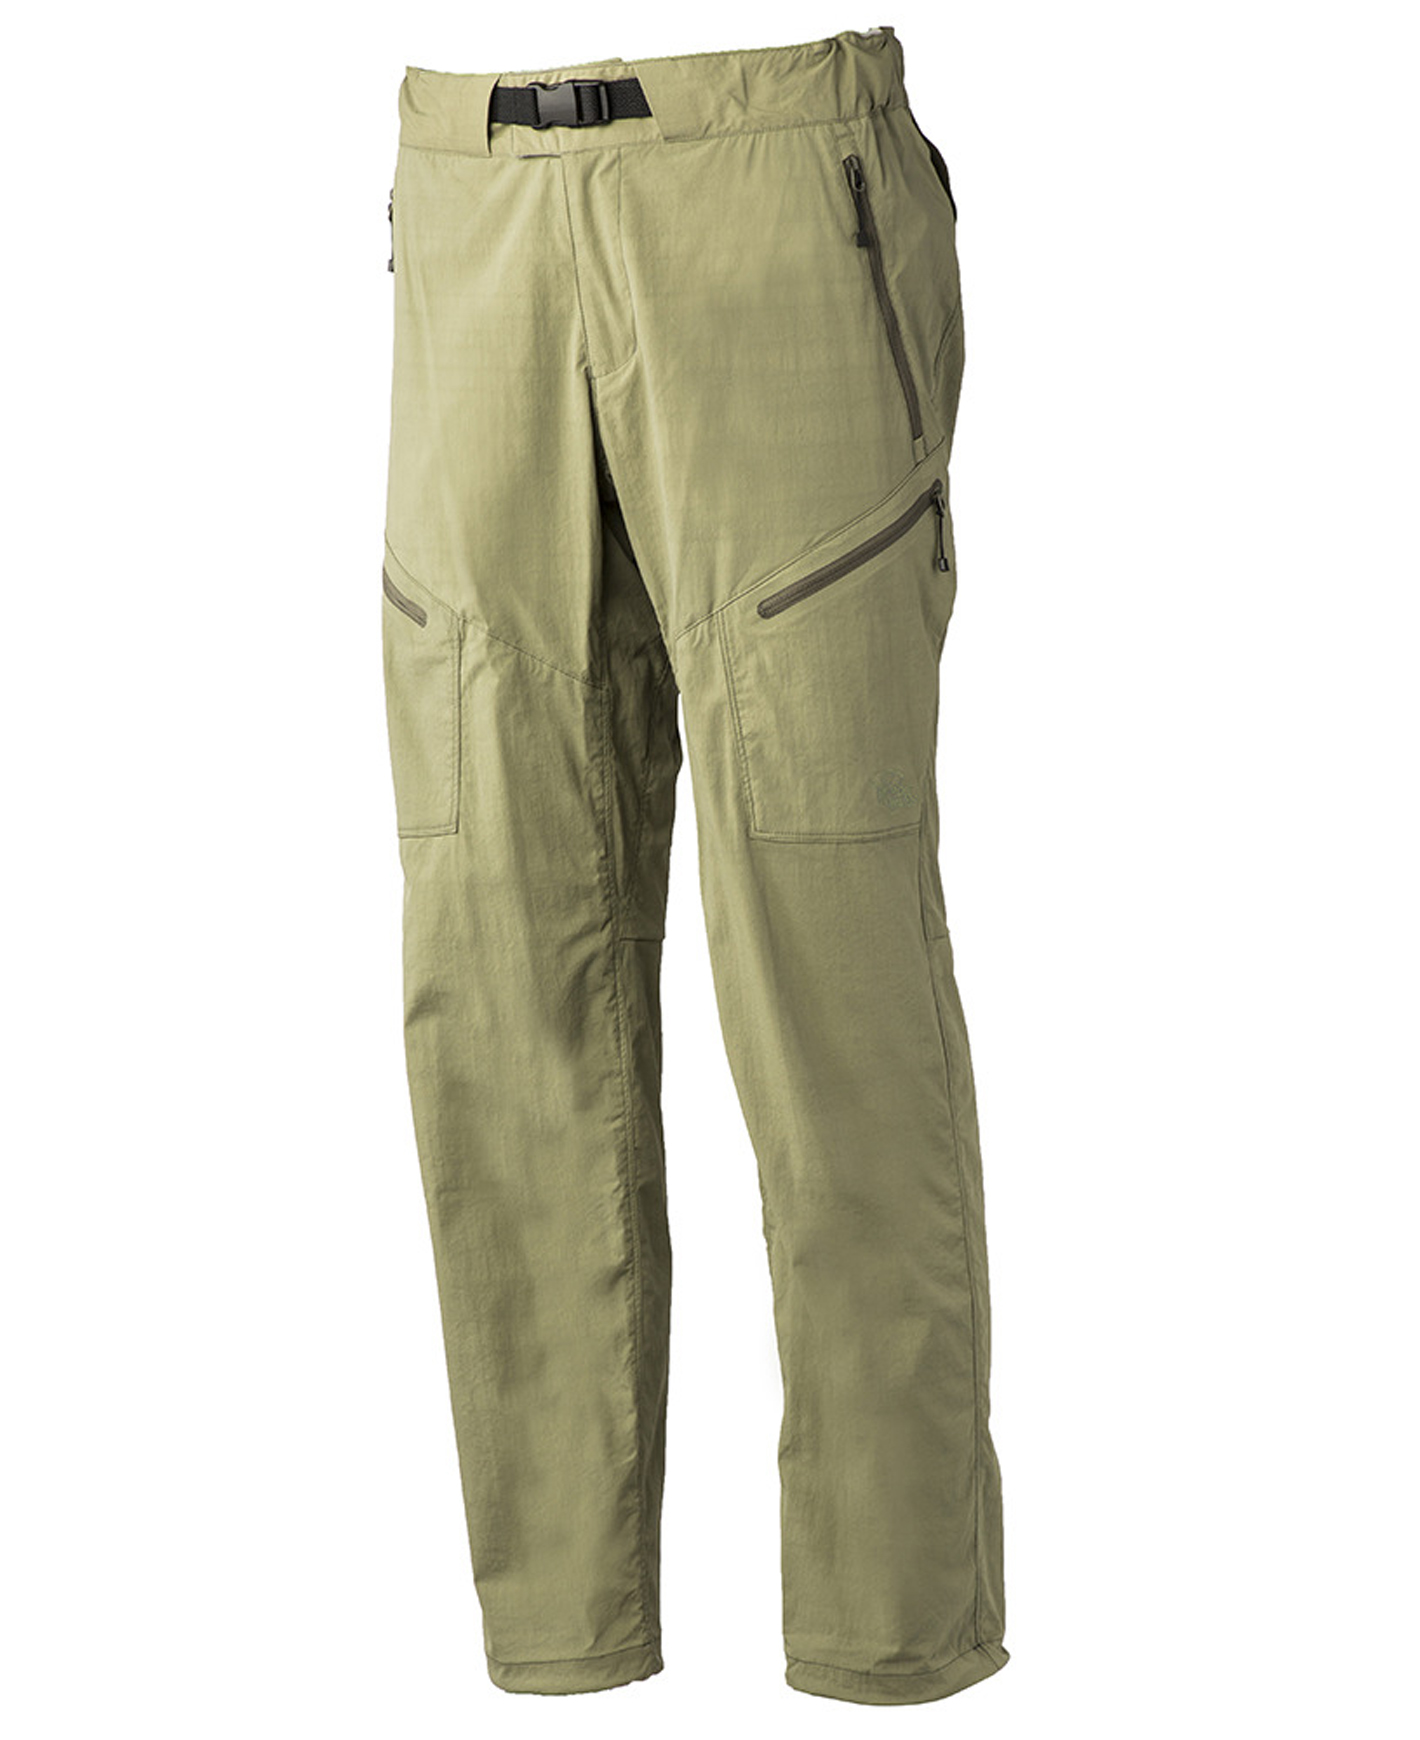 CORDURA L.W Trek Pants(コーデュラ L.W トレックパンツ)